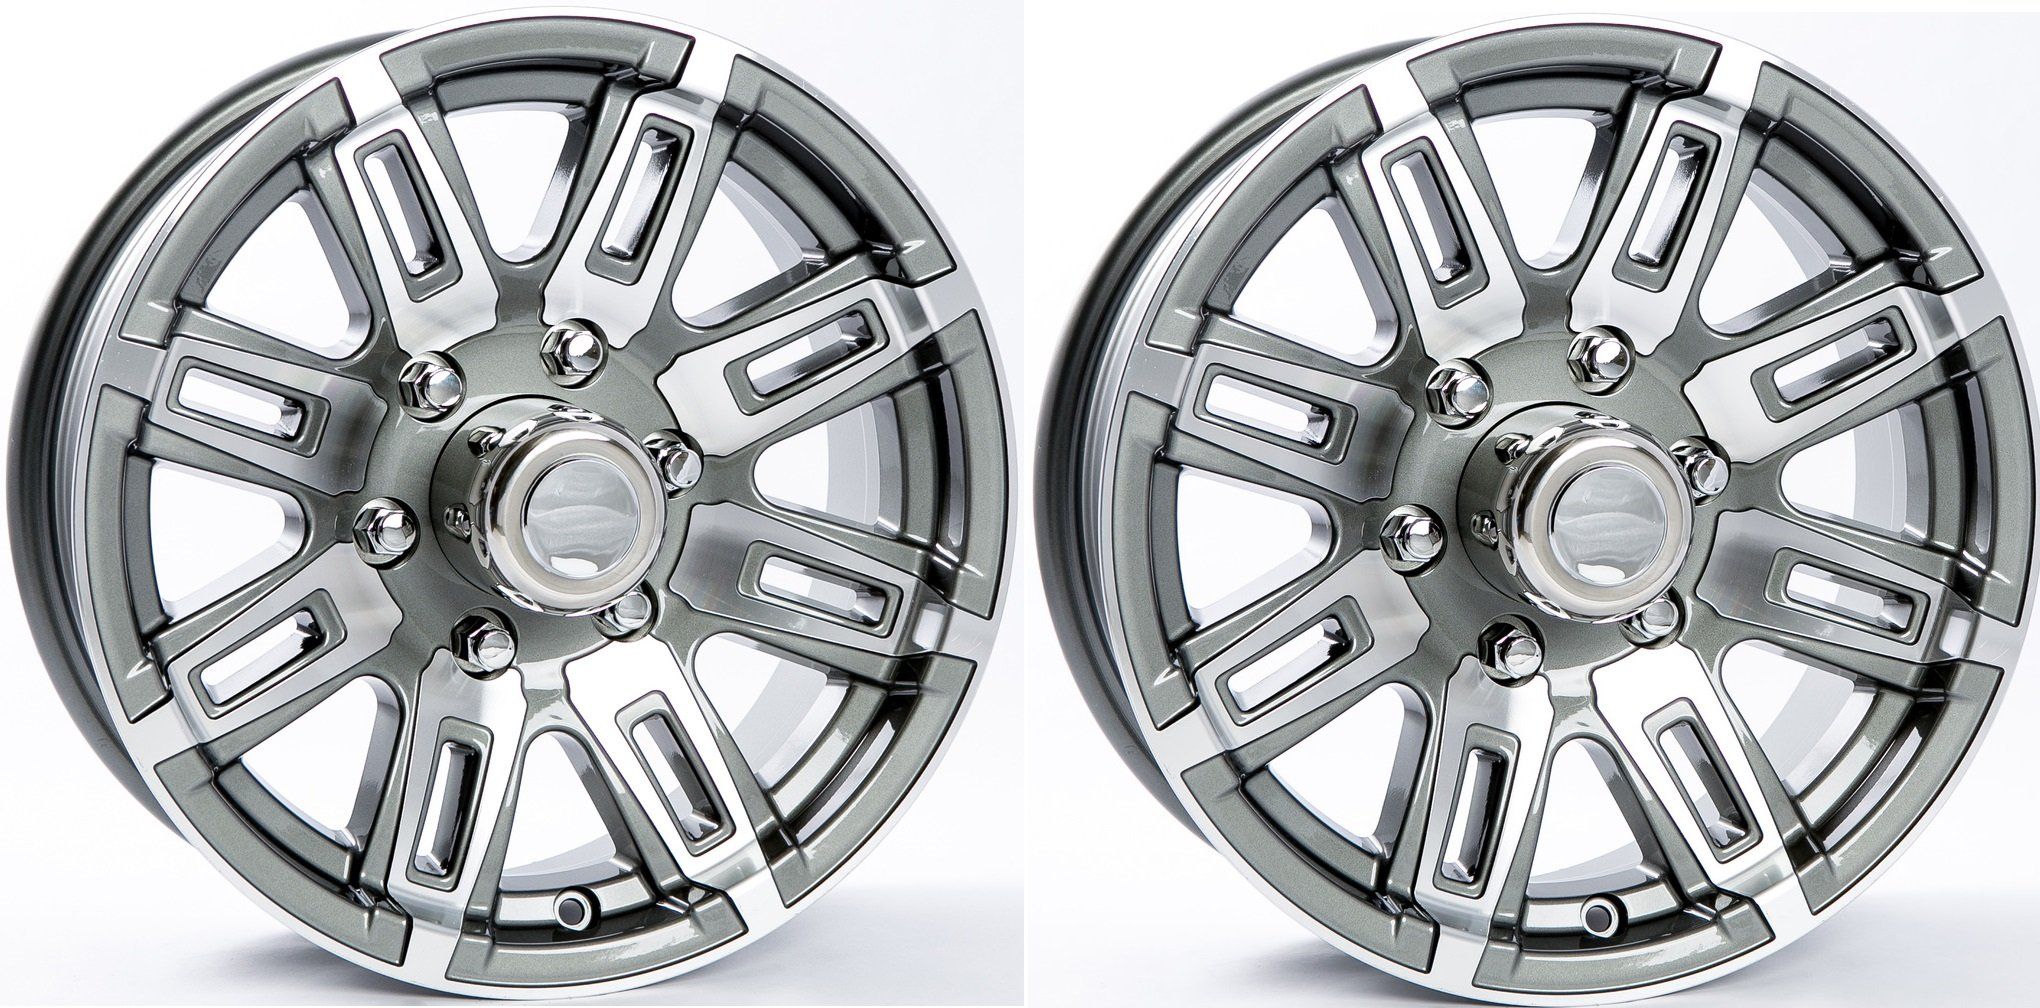 "eCustomRim 2-Pk Americana Trailer Wheel Grey Rim 16 x 6 Rec Spoke Style 6 Lug On 5.5"""